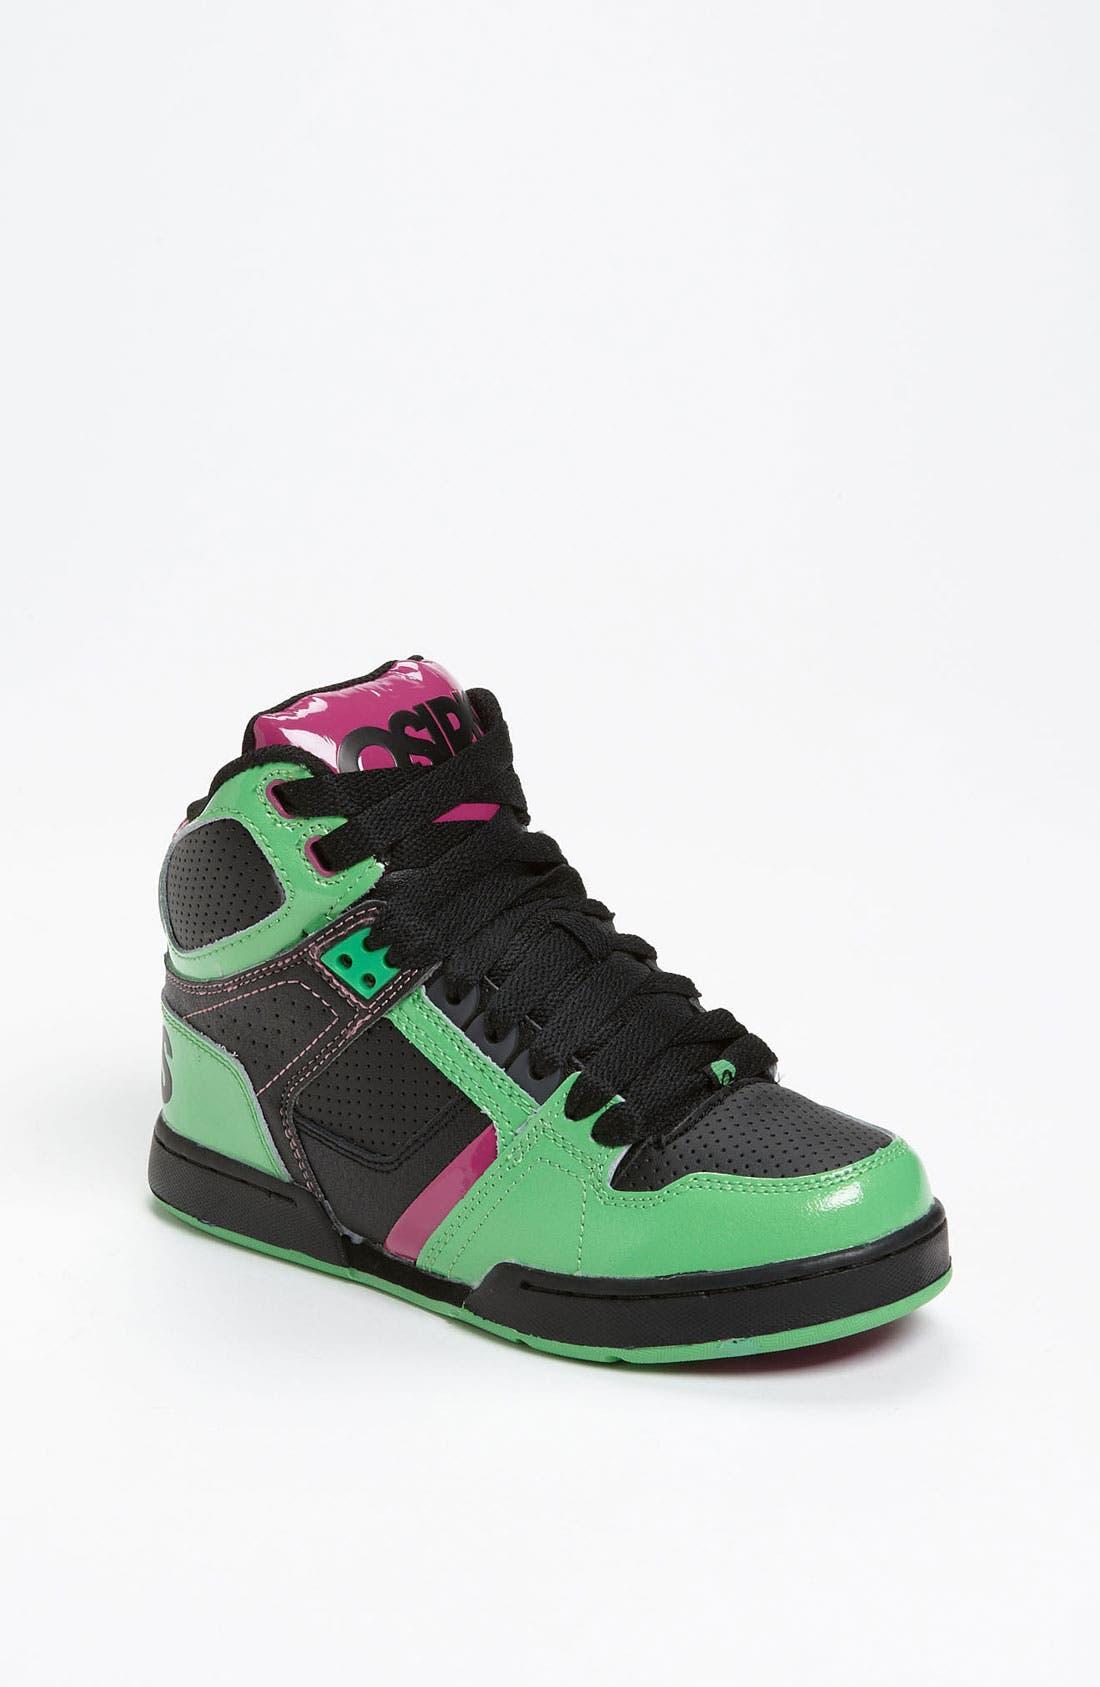 Alternate Image 1 Selected - Osiris 'NYC 83' Skate Shoe (Big Kid)